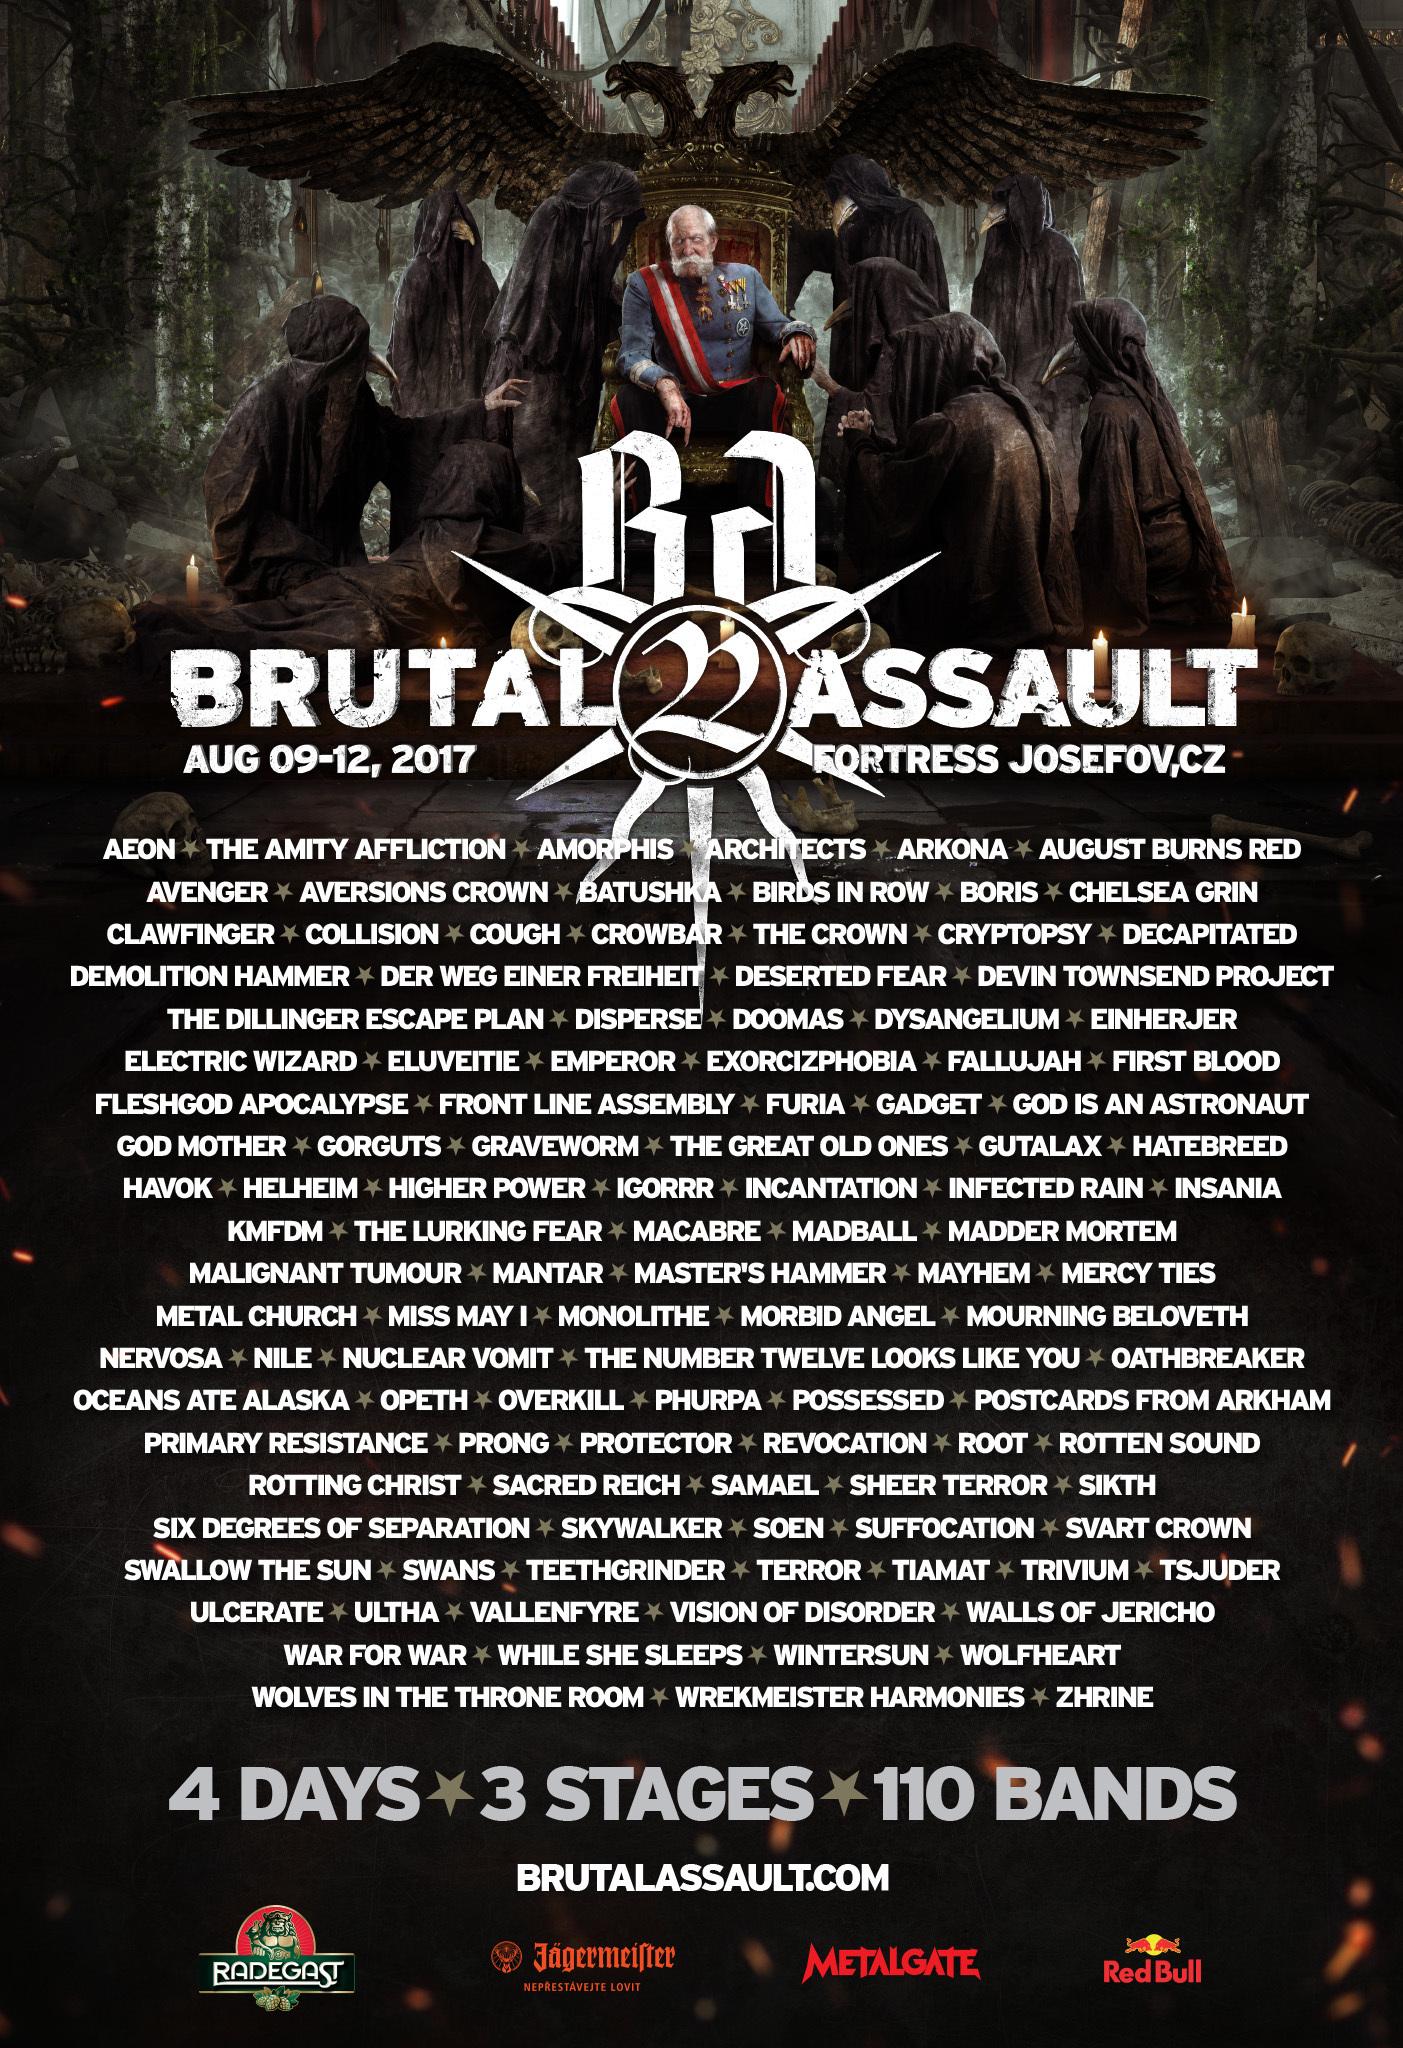 Brutal Assault Festival 2017 Cartel De Bandas